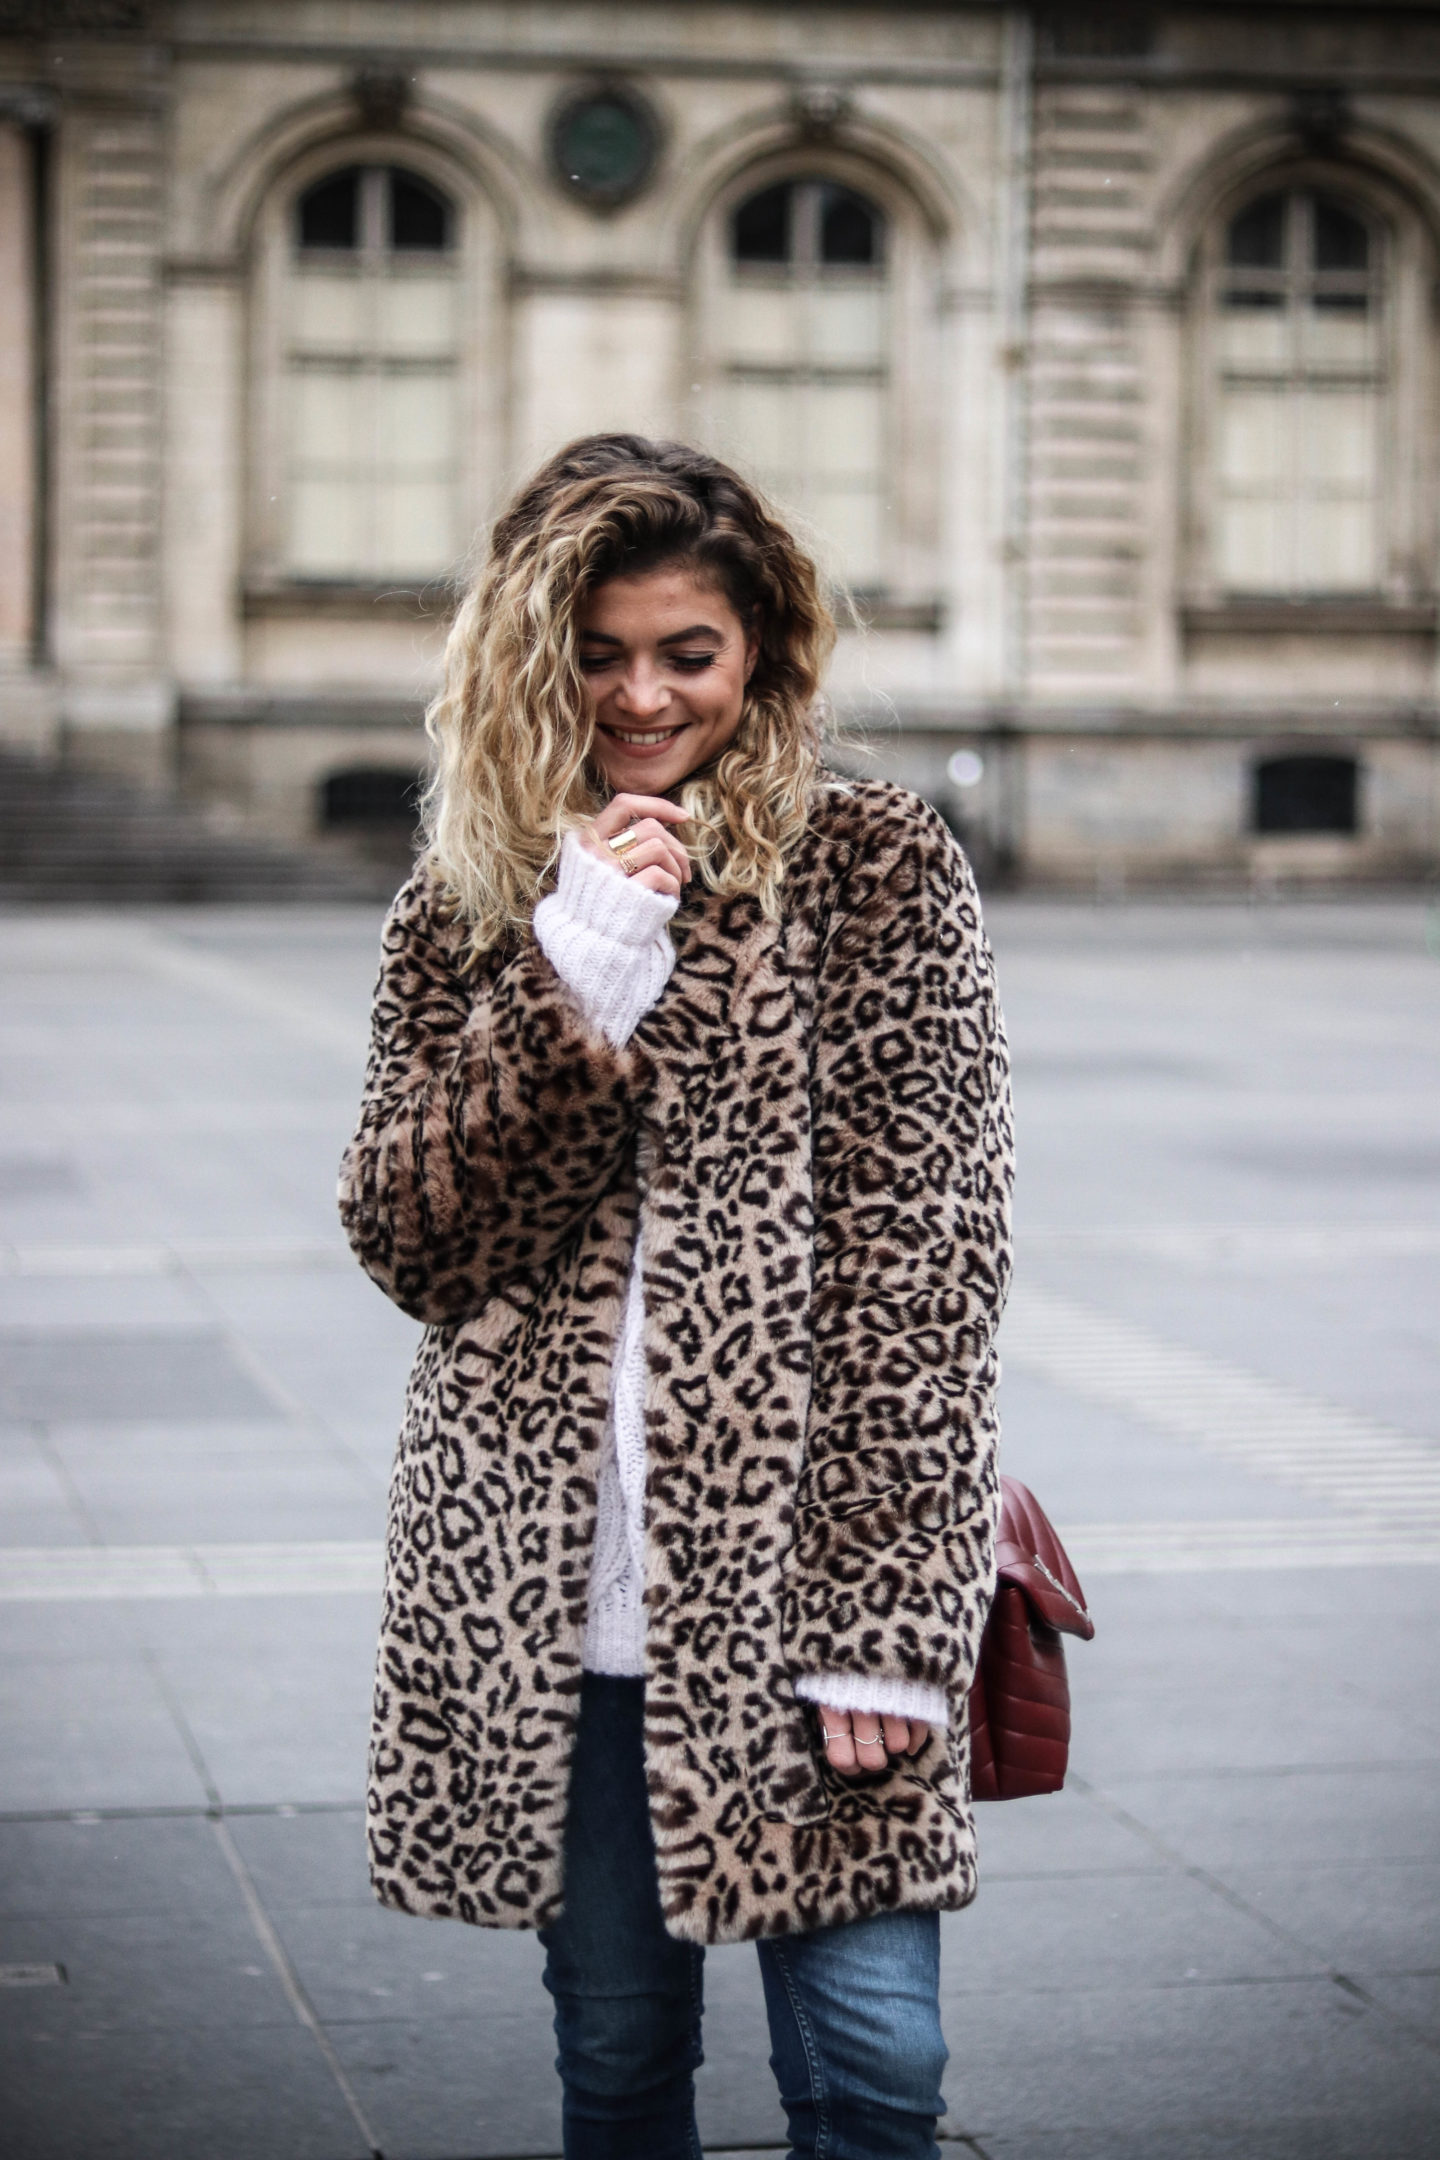 manteau léopard marie and mood blog mode